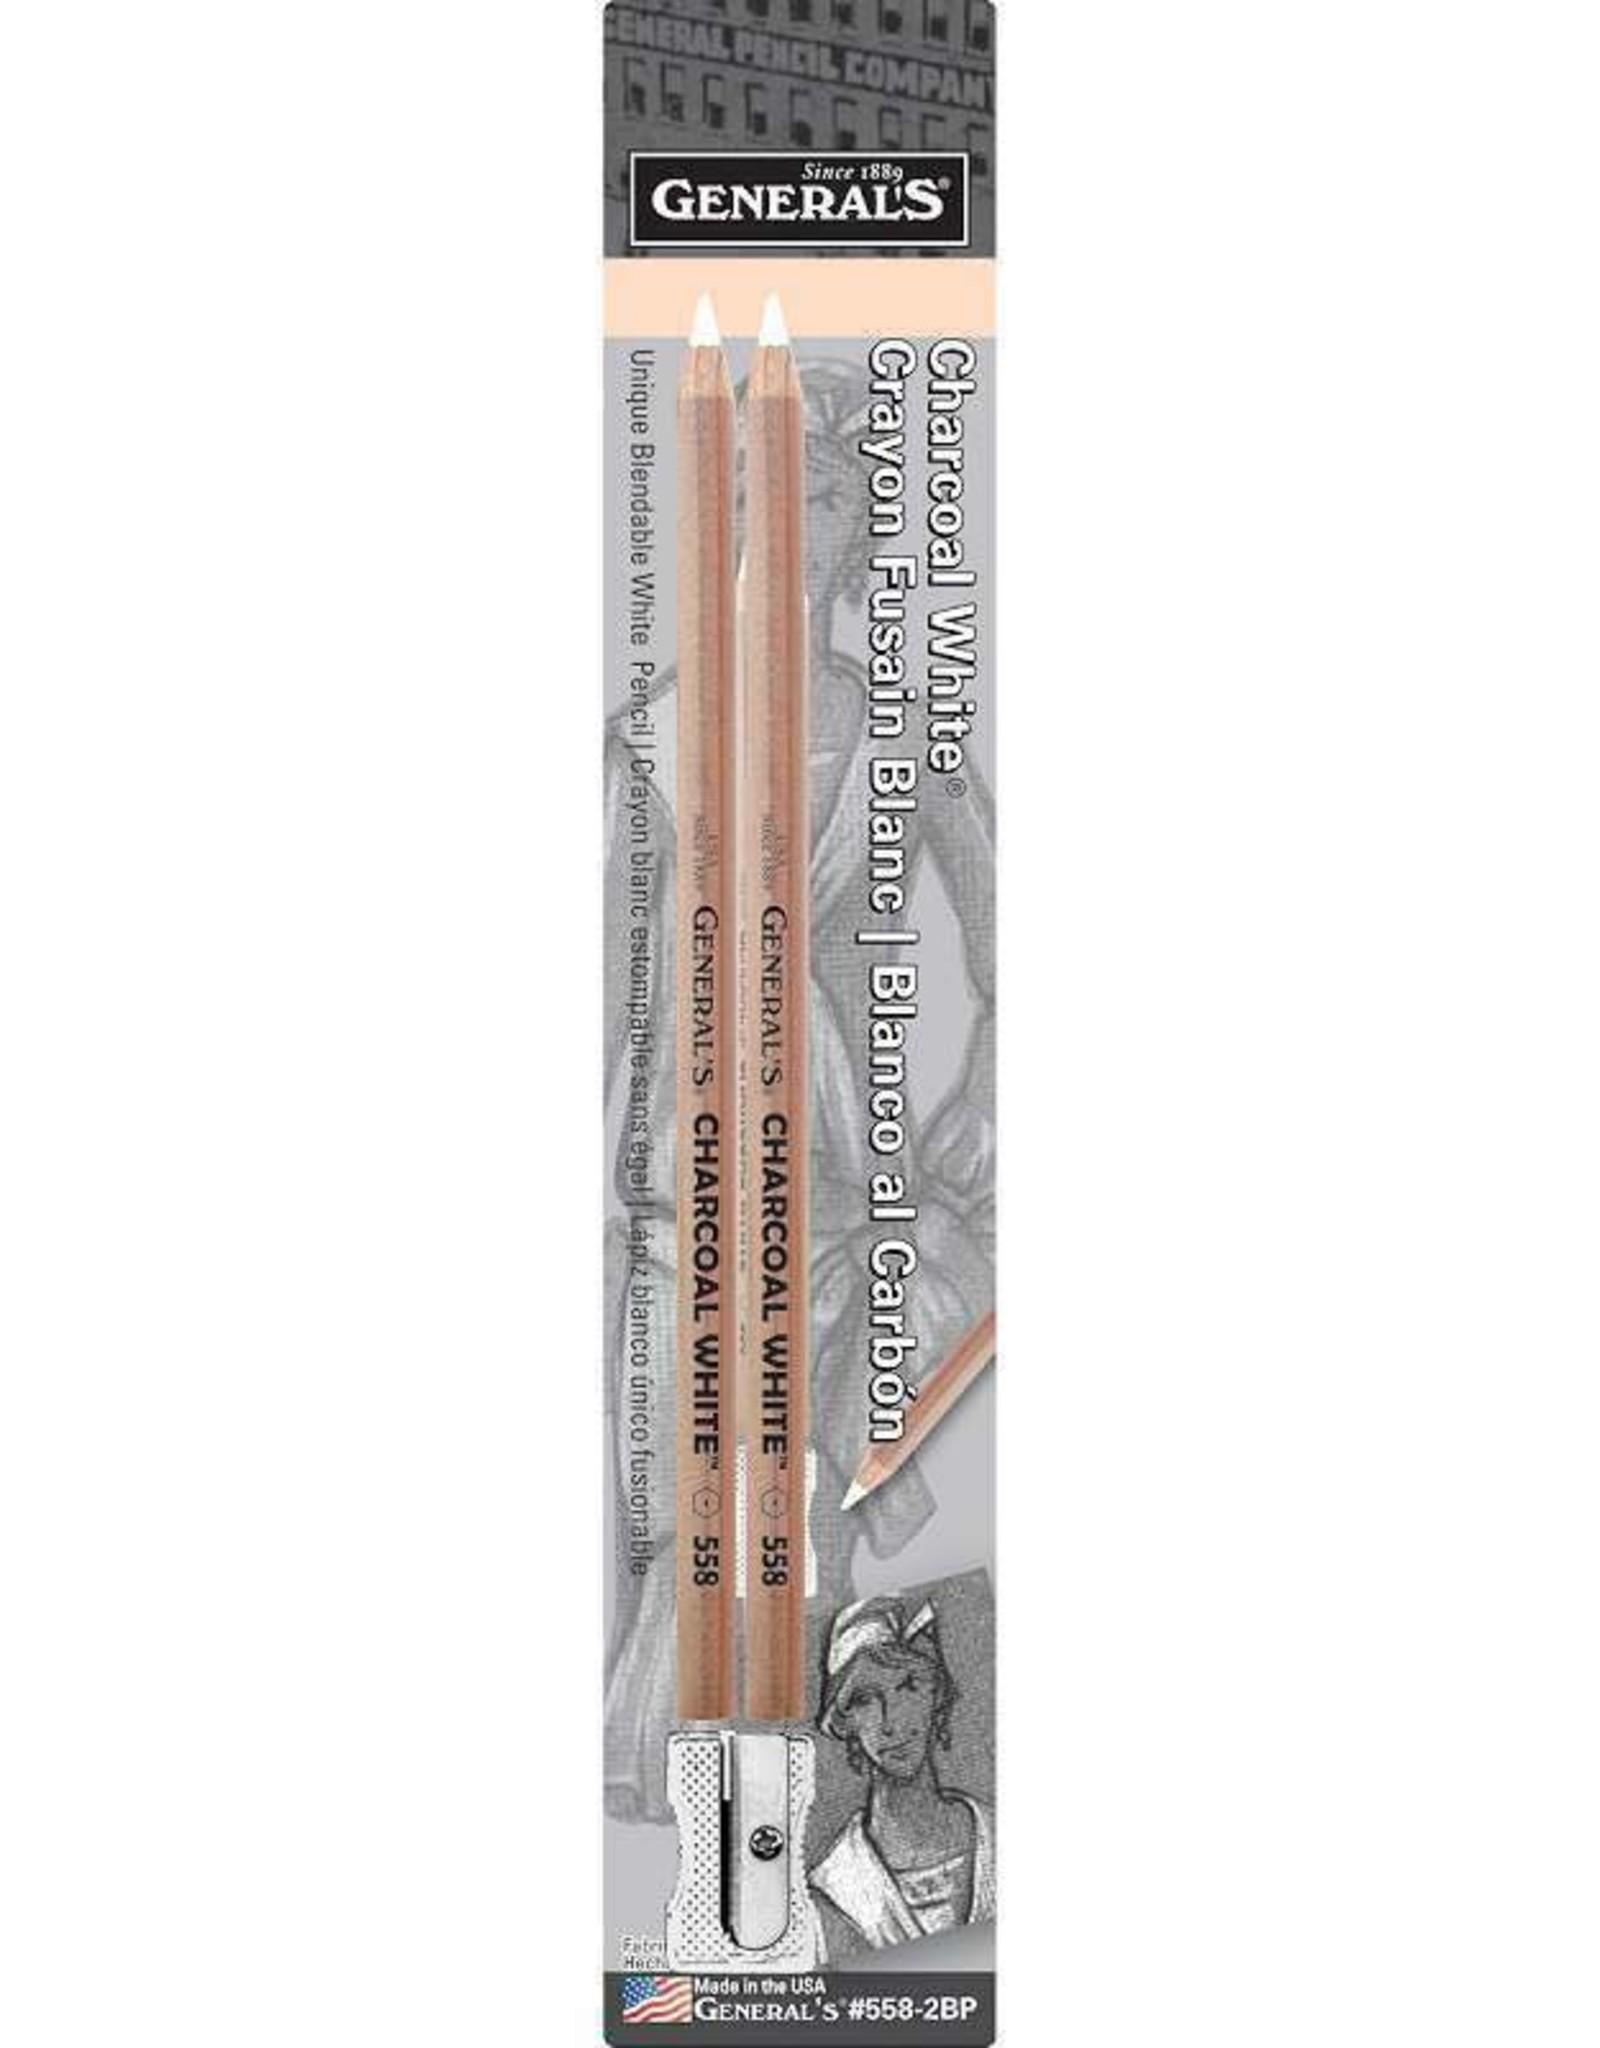 General Pencil General Pencil Charcoal White Pencils 2B 2pk